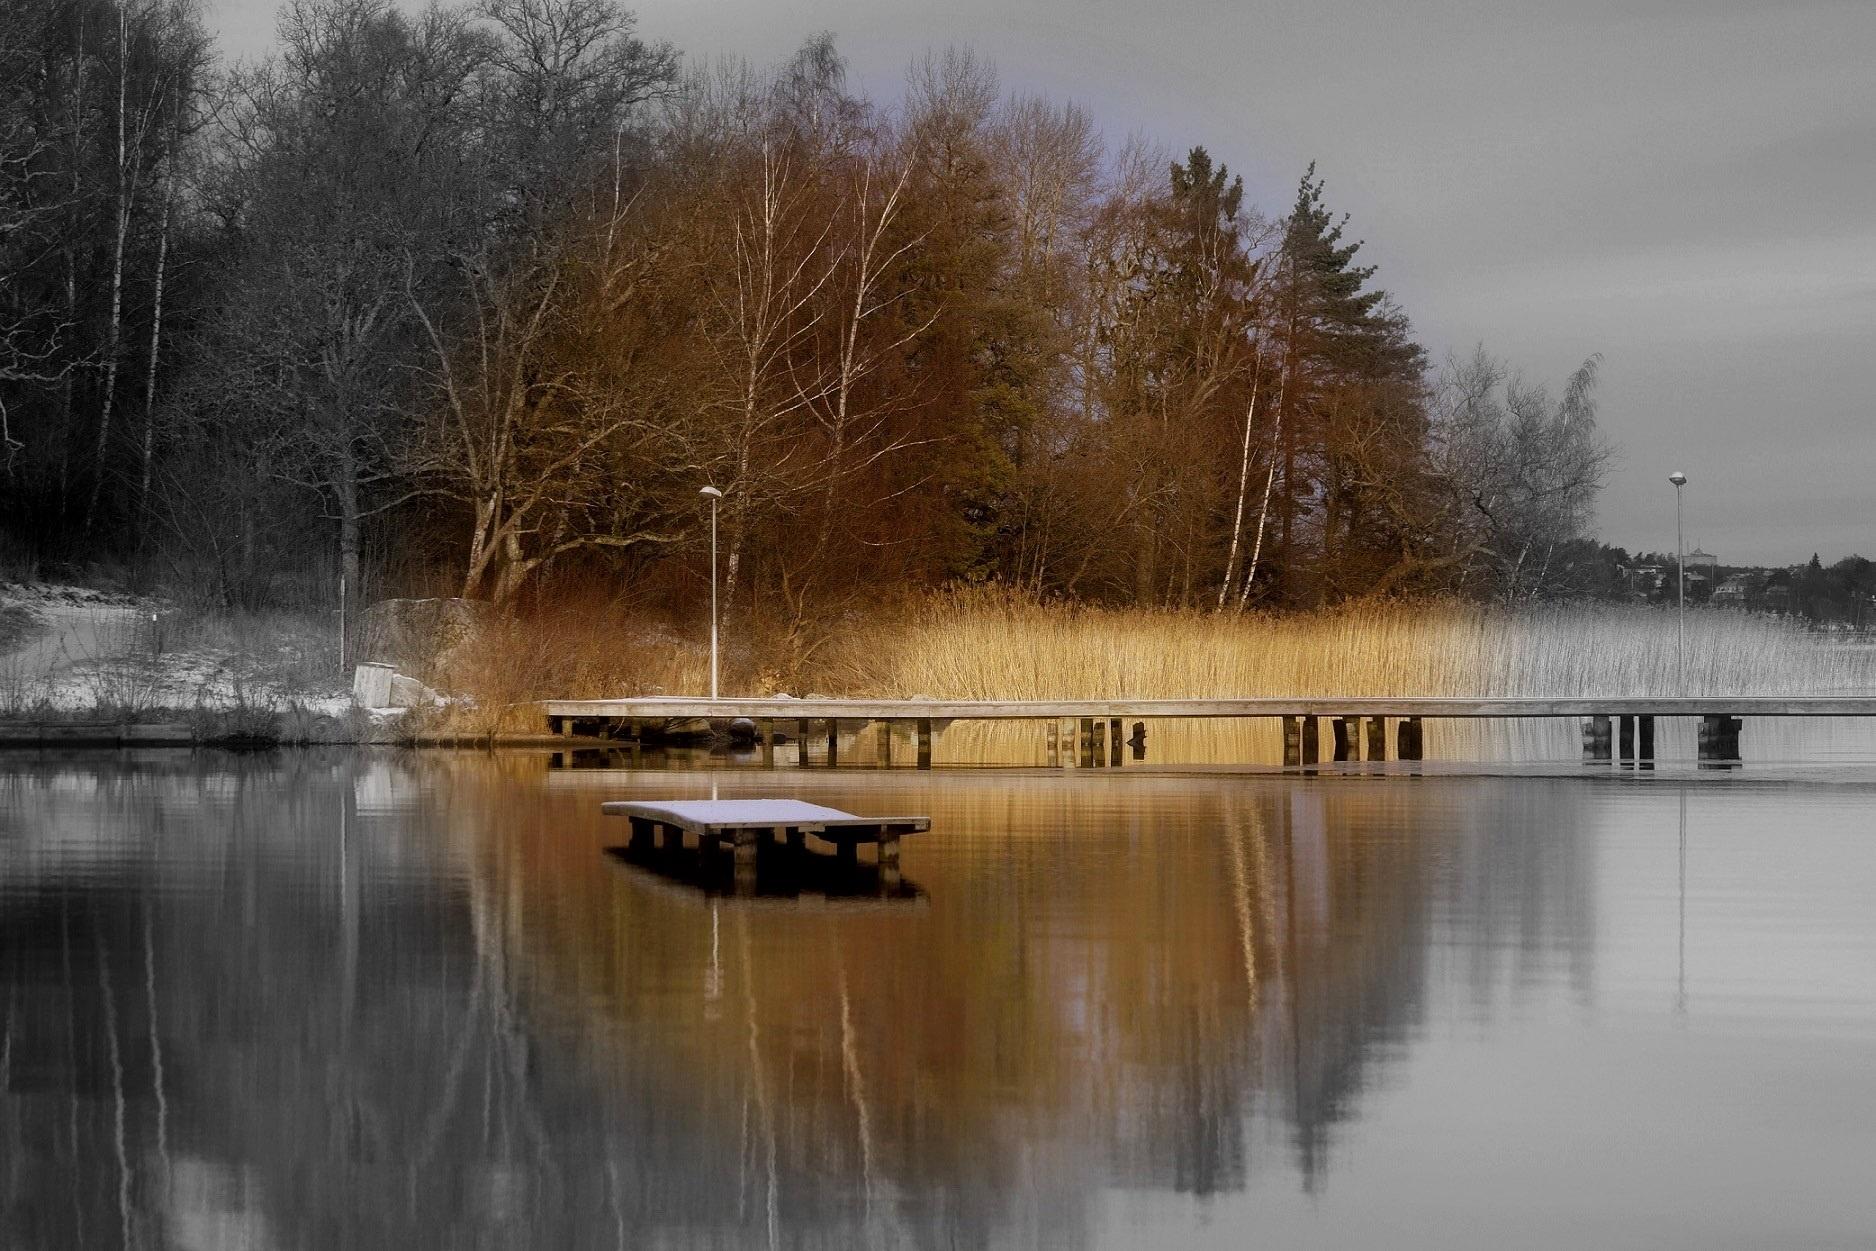 My place in Sweden by daniella.micklin